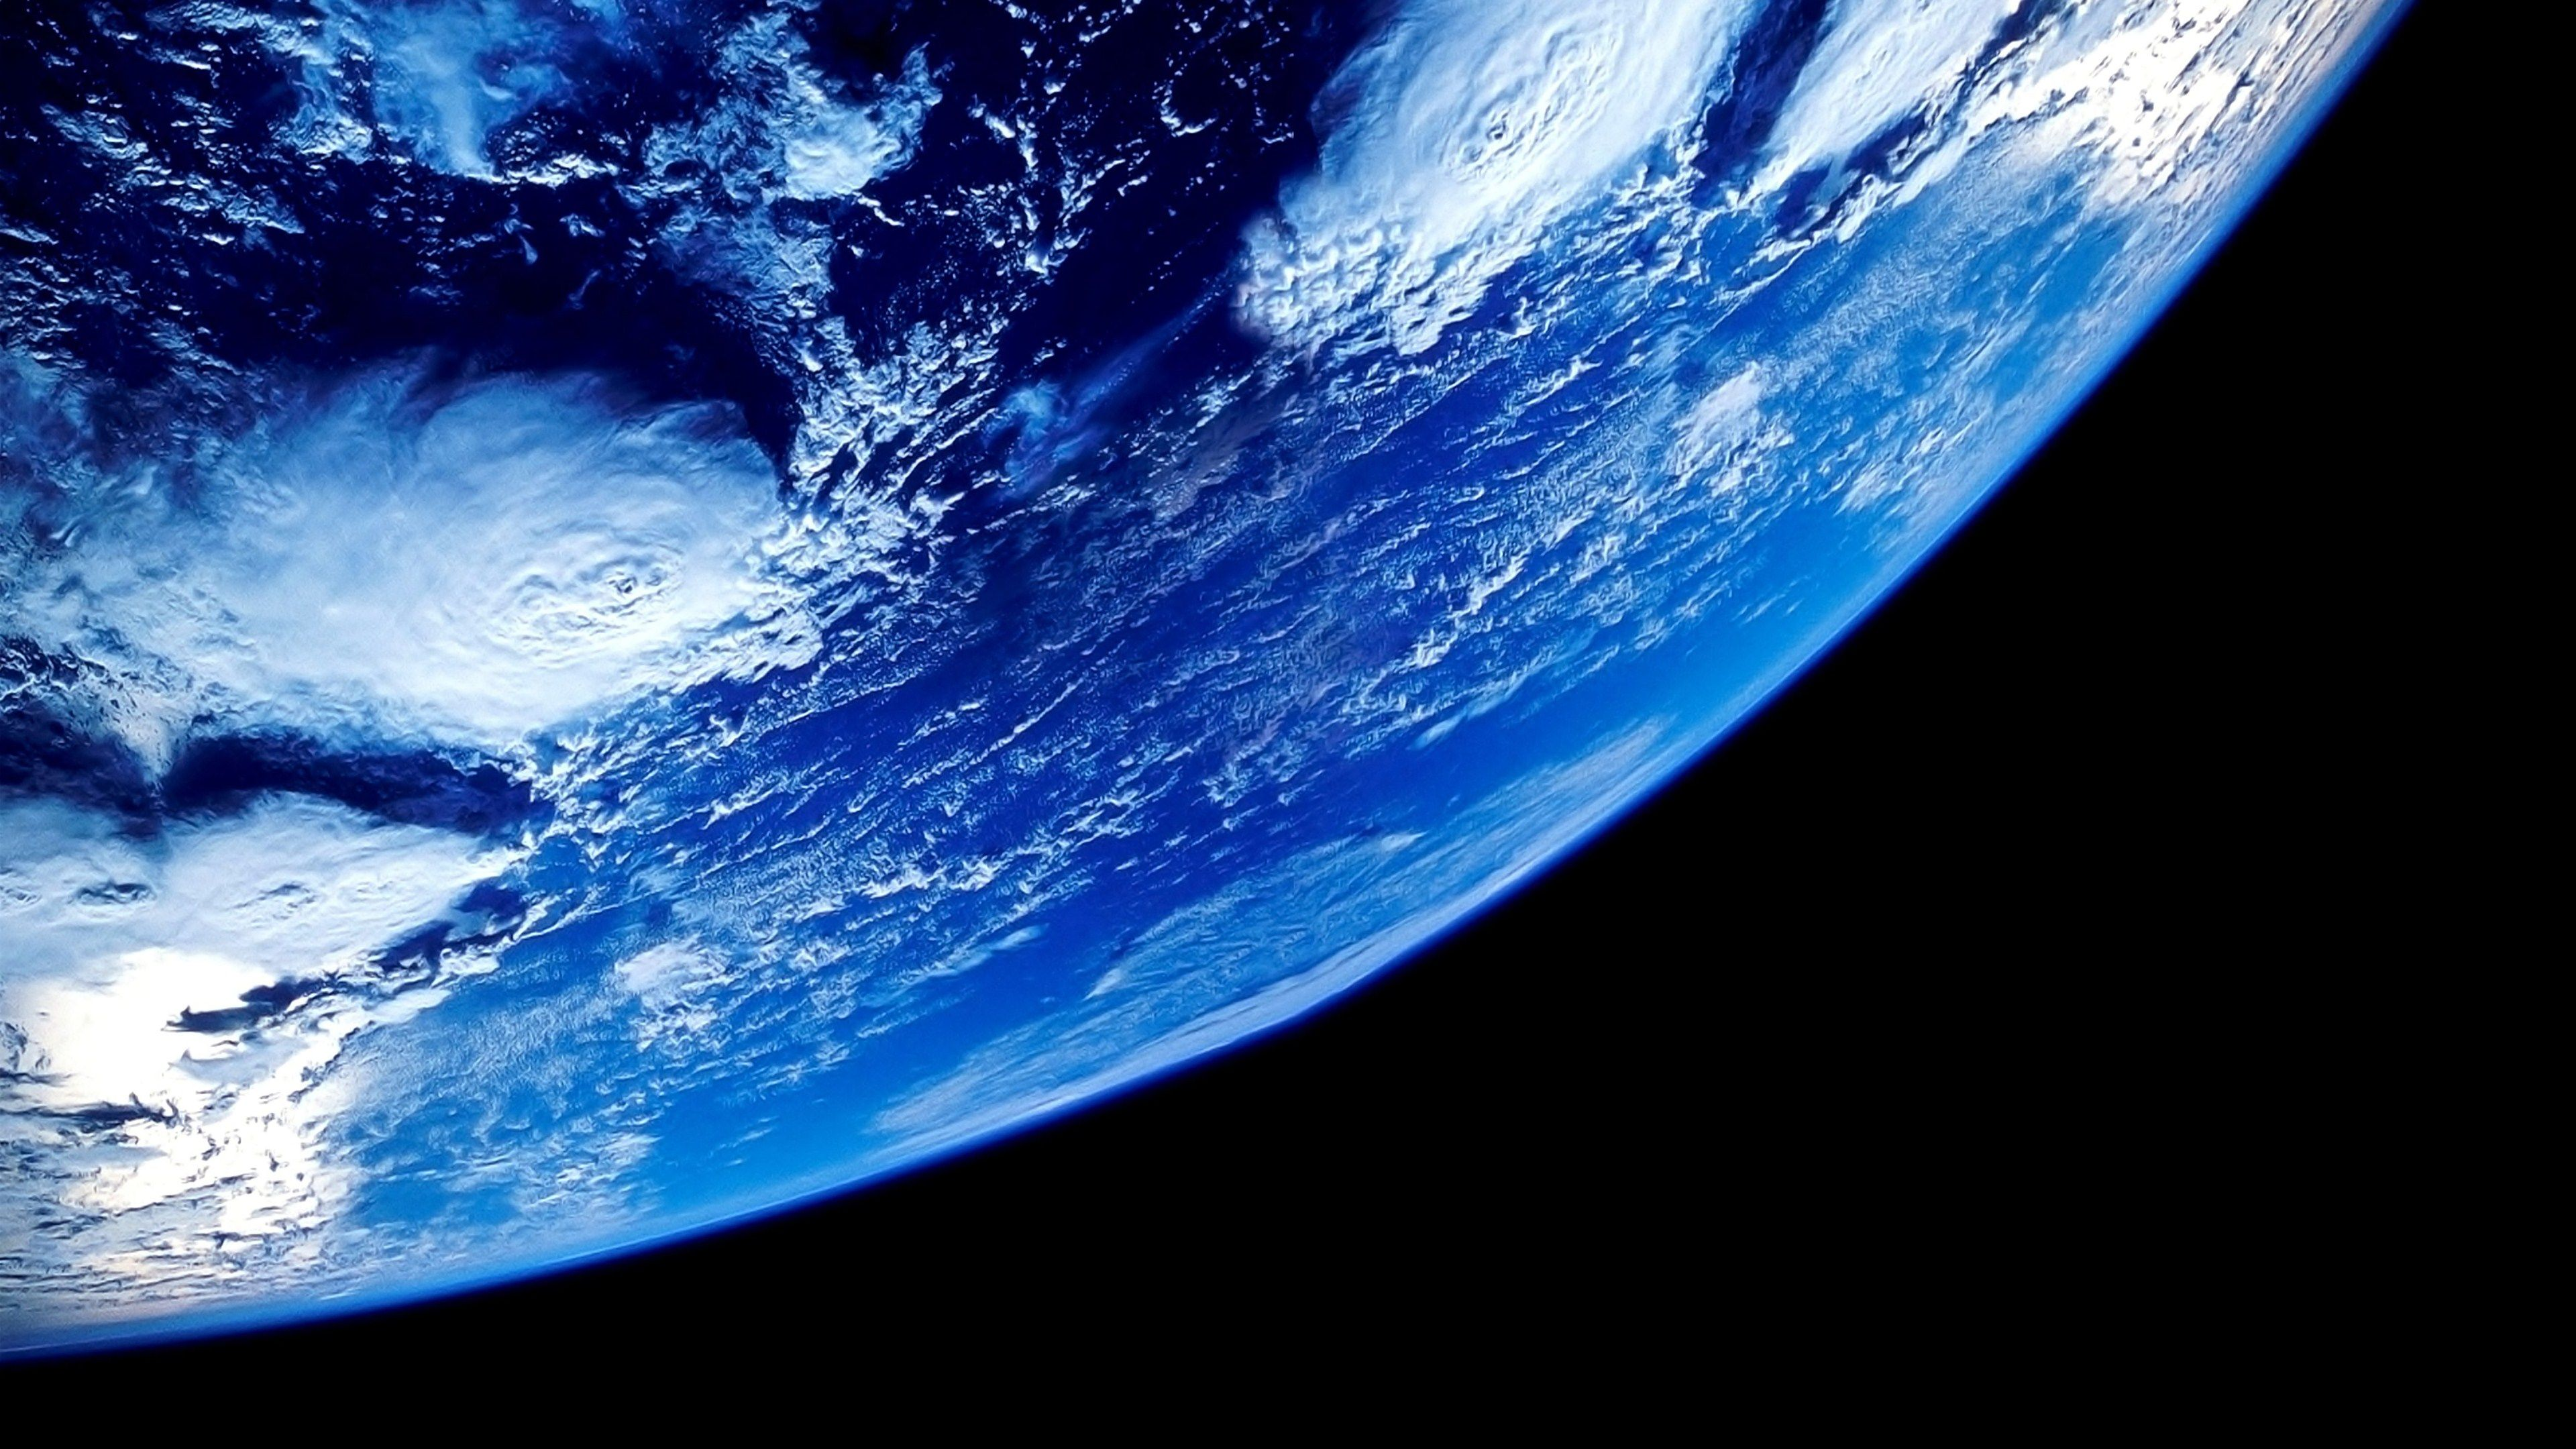 Wallpaper 4k Planet Hd Hd Wallpaper Backgrounds Tumblr Backgrounds Wallpaper Earth Earth From Space Planets Wallpaper